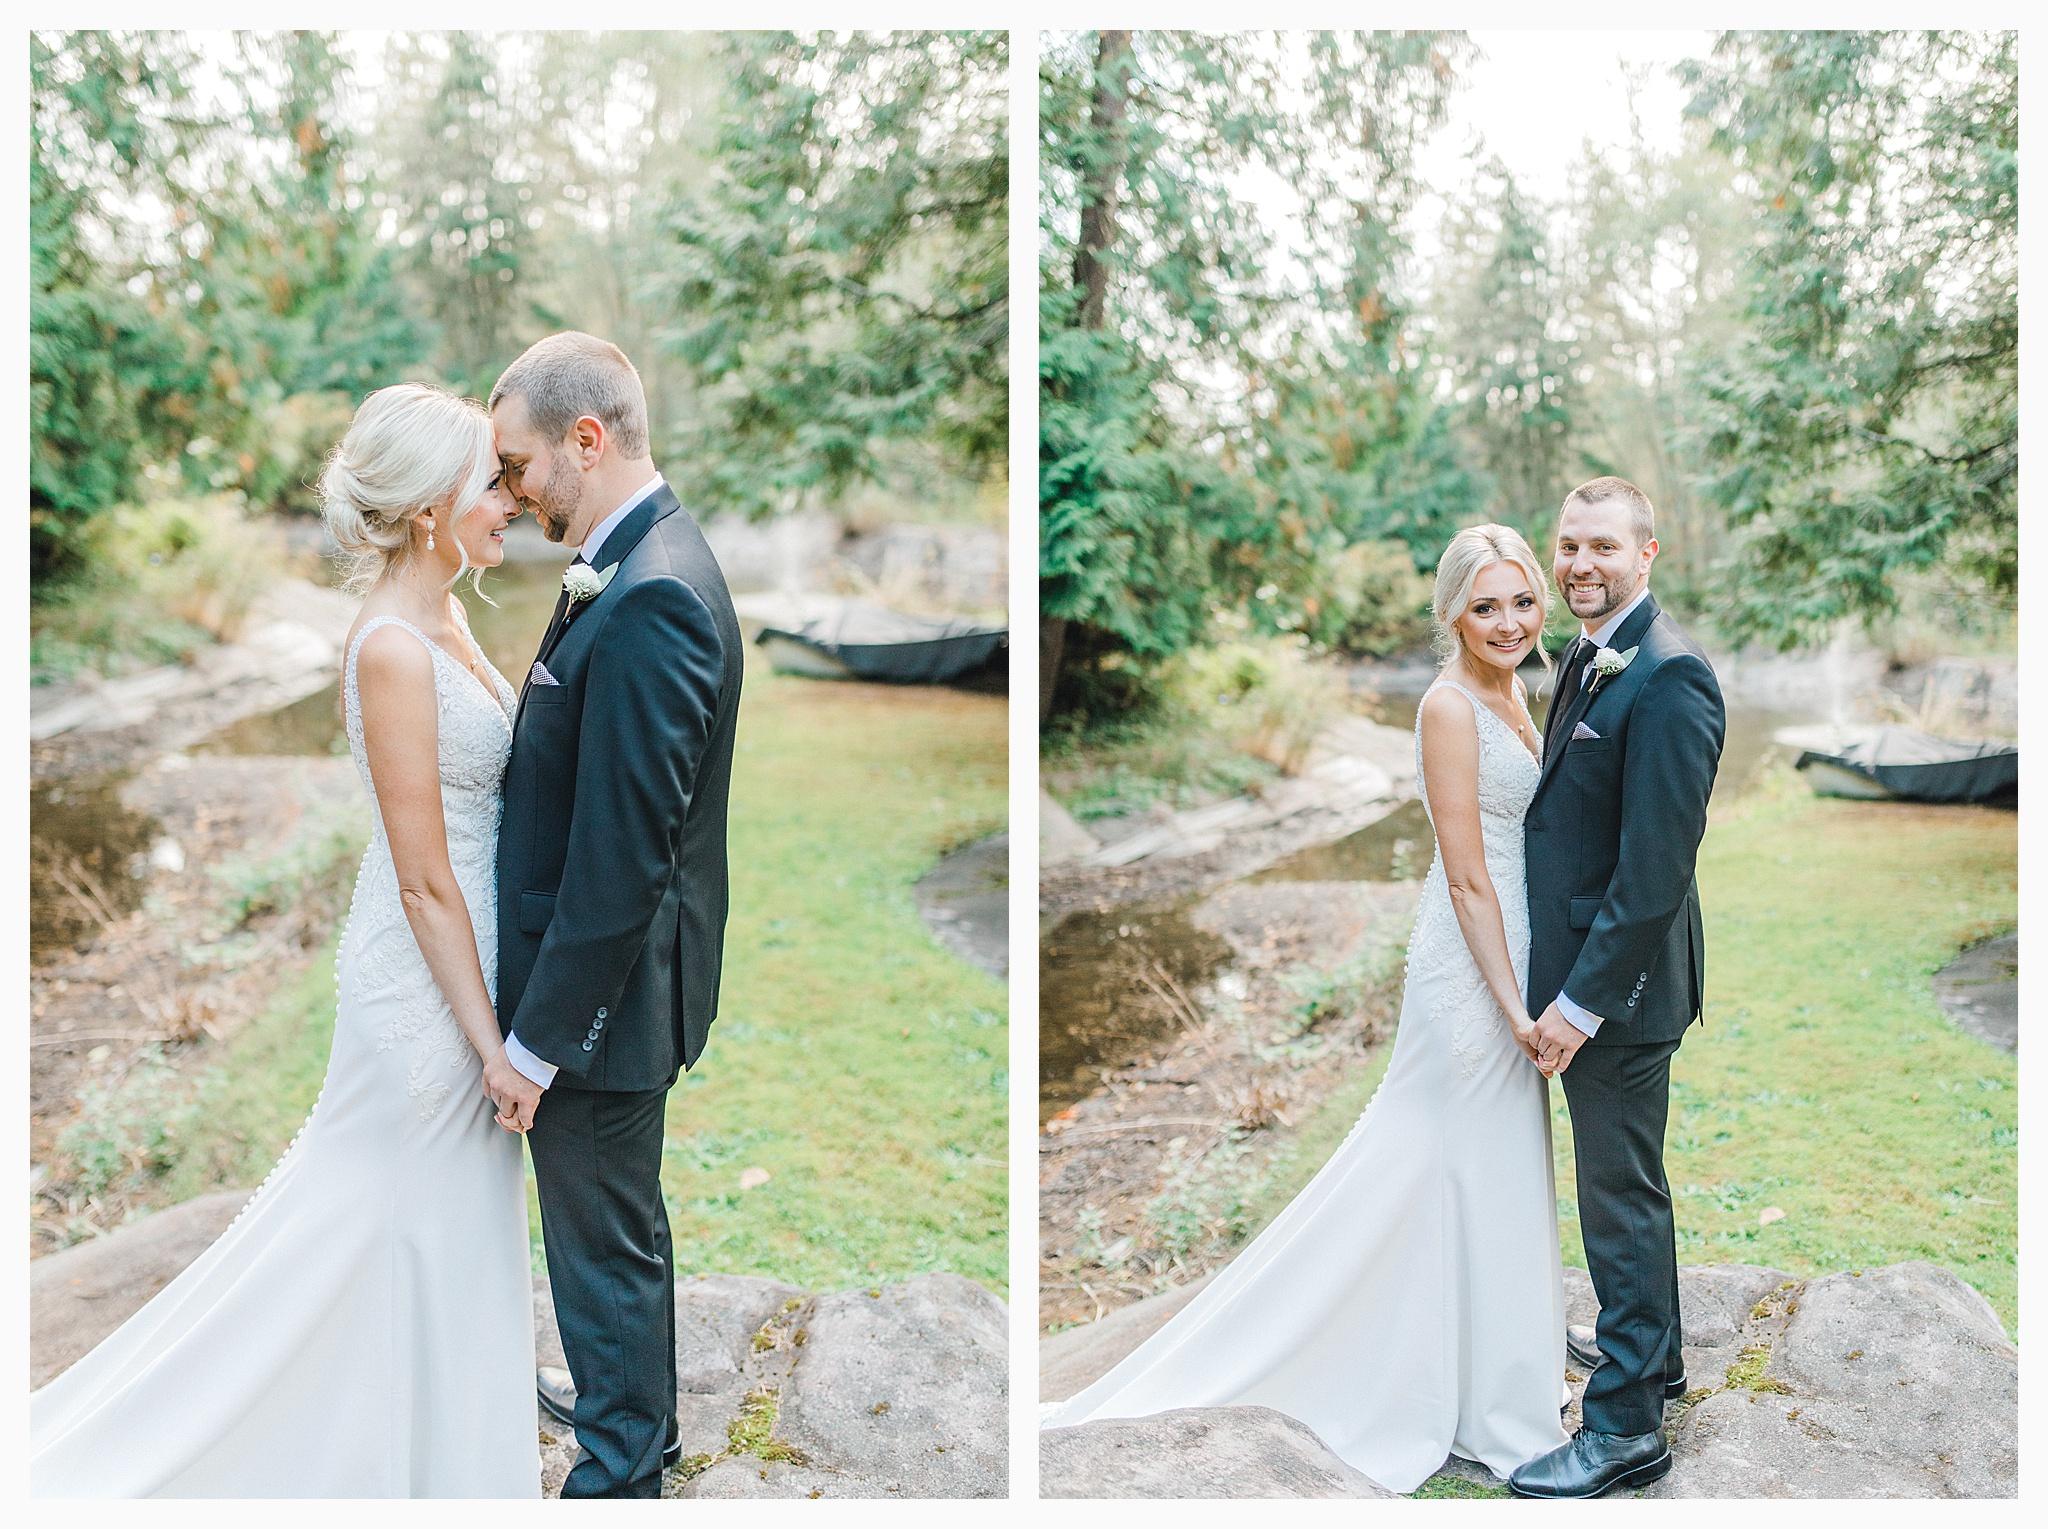 Emma Rose Company Light and Airy Wedding Photographer, Beautiful fall wedding at Rock Creek Gardens Venue in Puyallup, Washington._0032.jpg